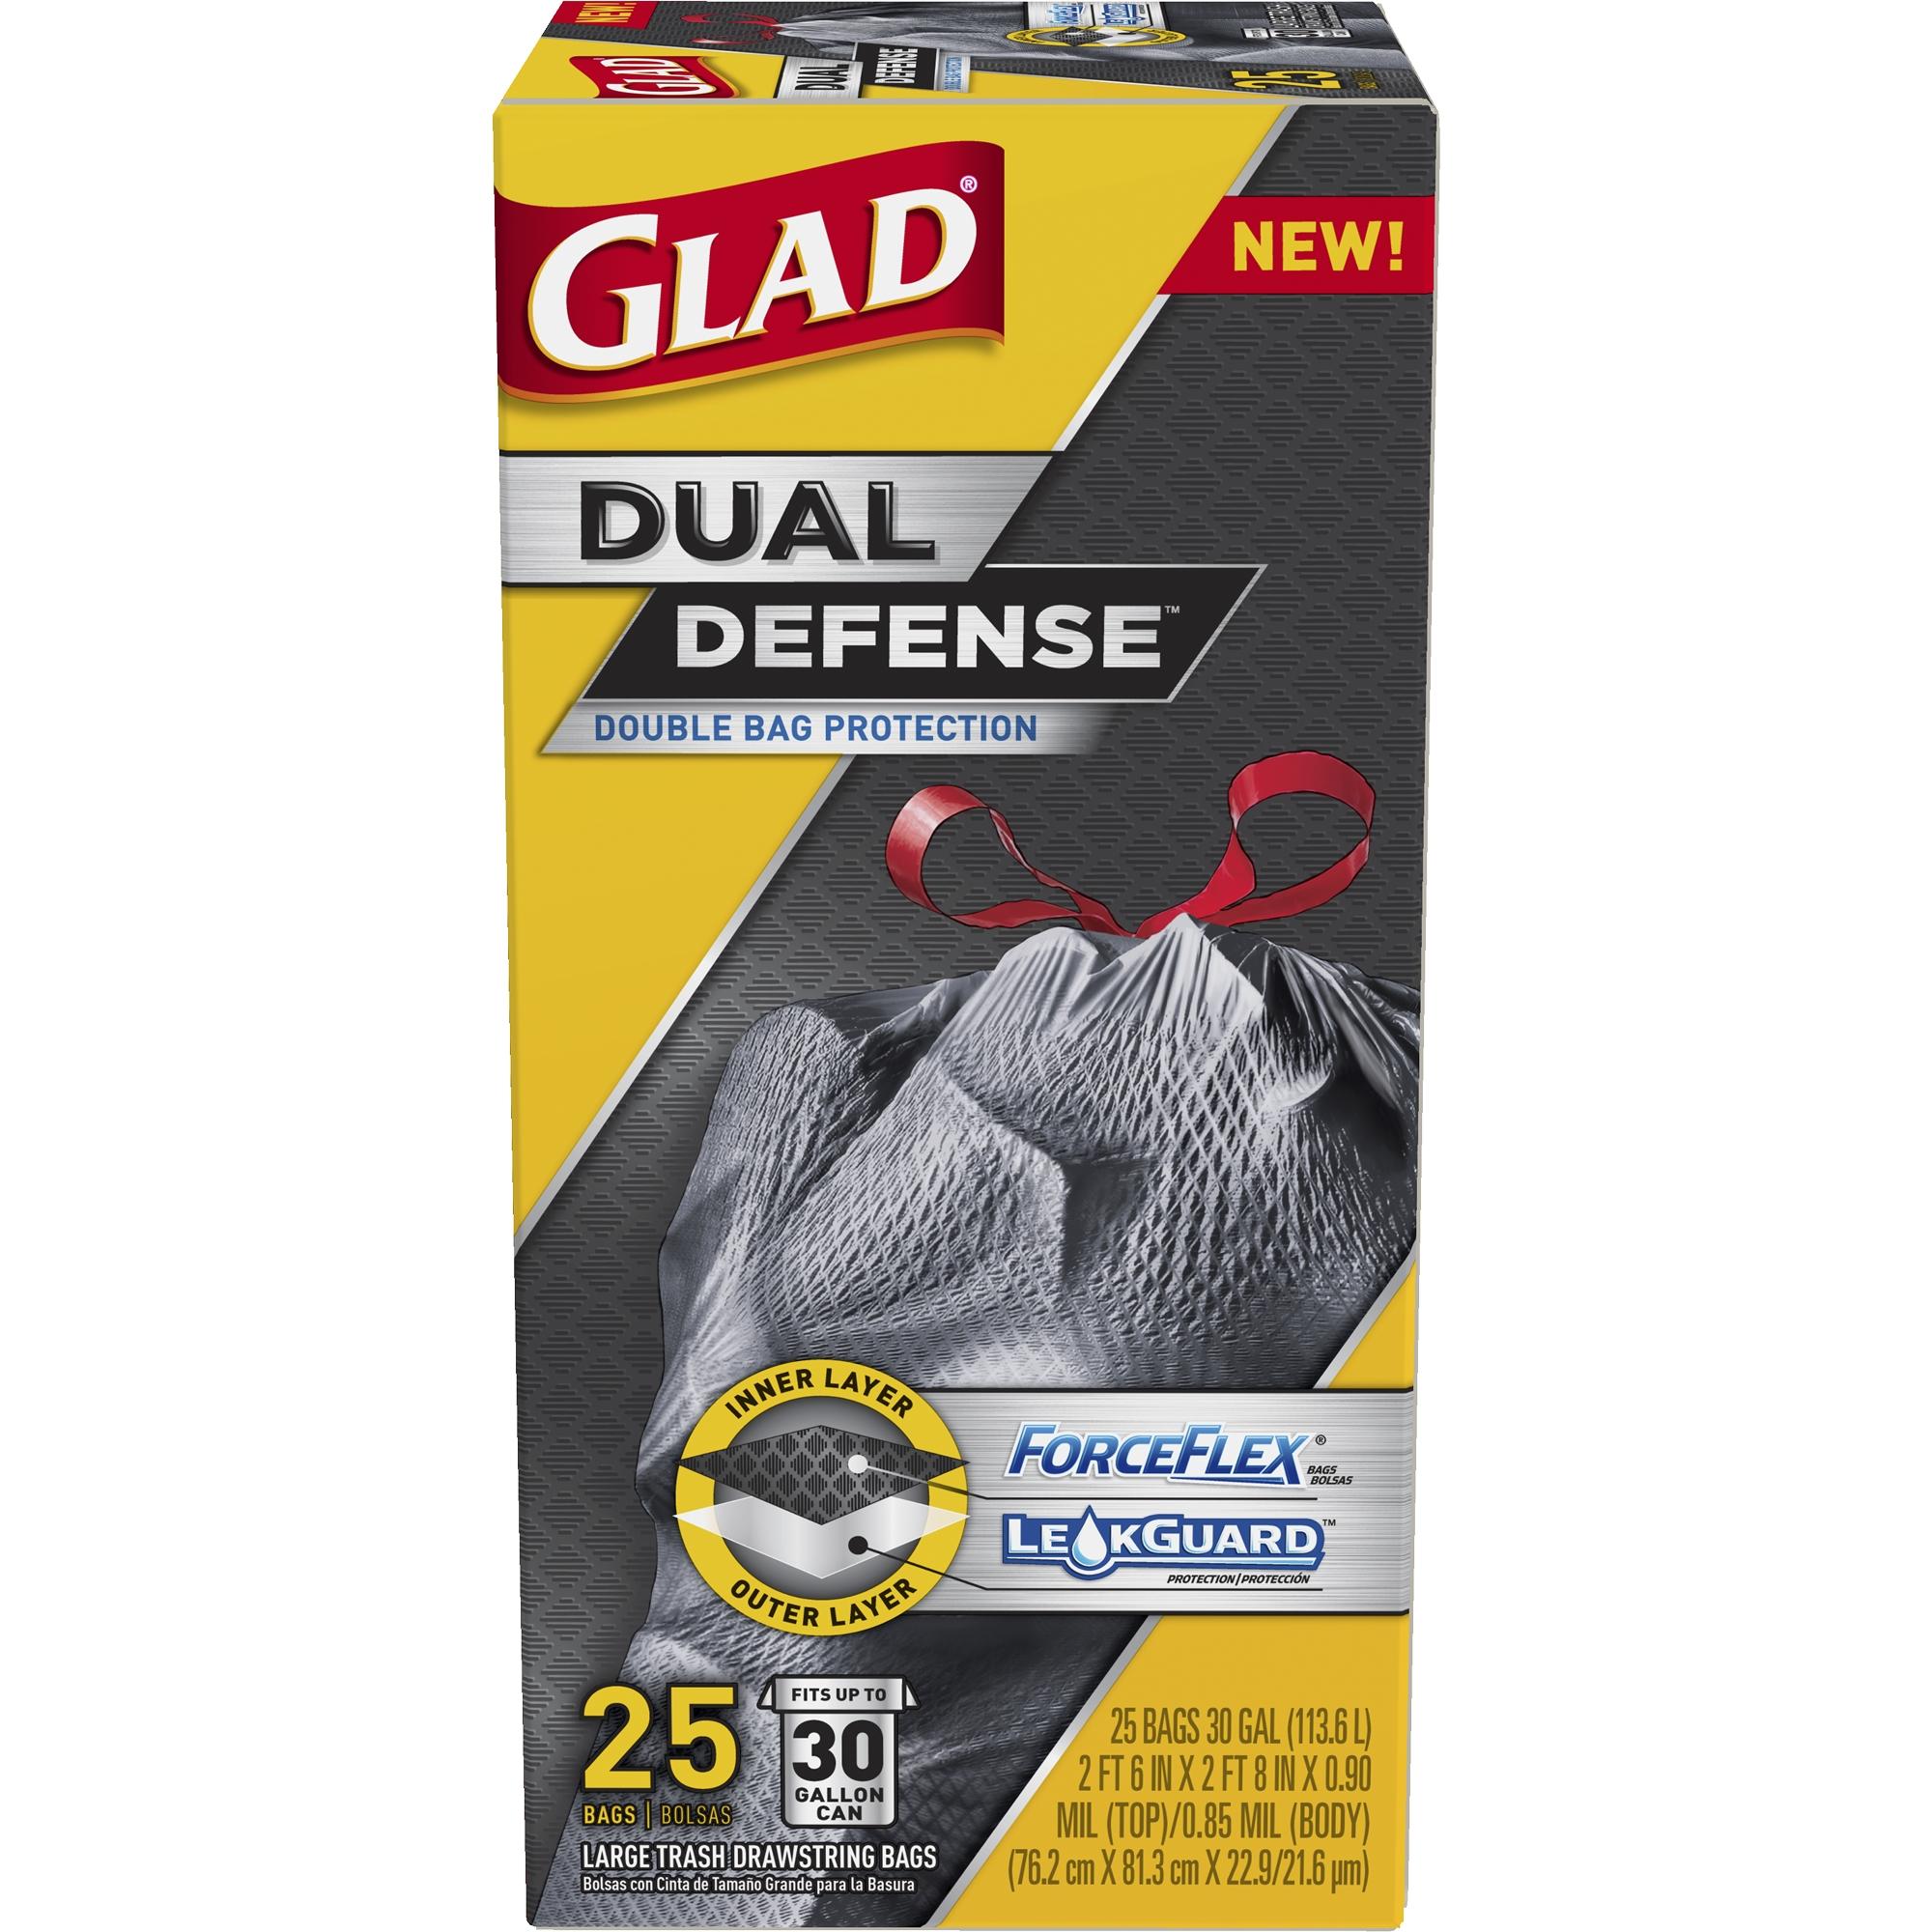 Glad Dual Defense Drawstring Large Trash Bags, 30 Gallon, 25 Count